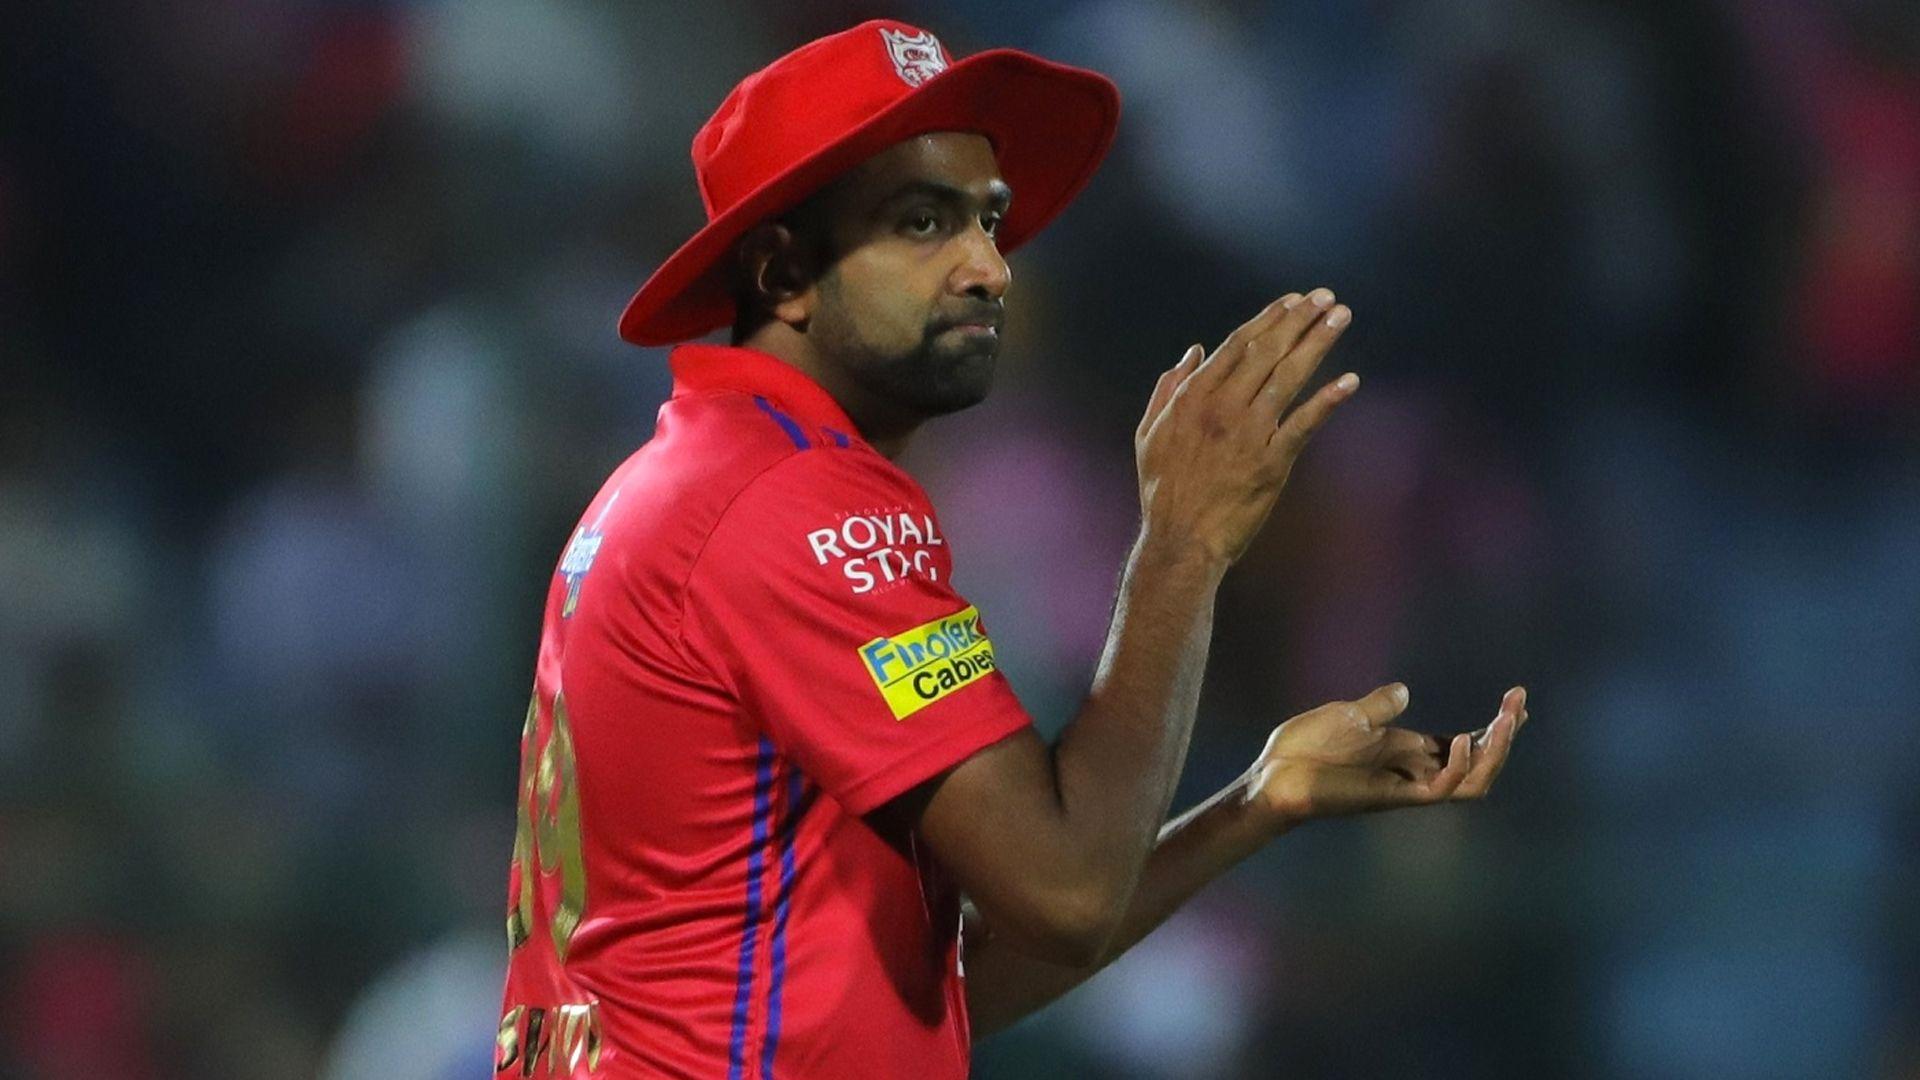 Passion or provocation: did Kohli mock Ashwin?